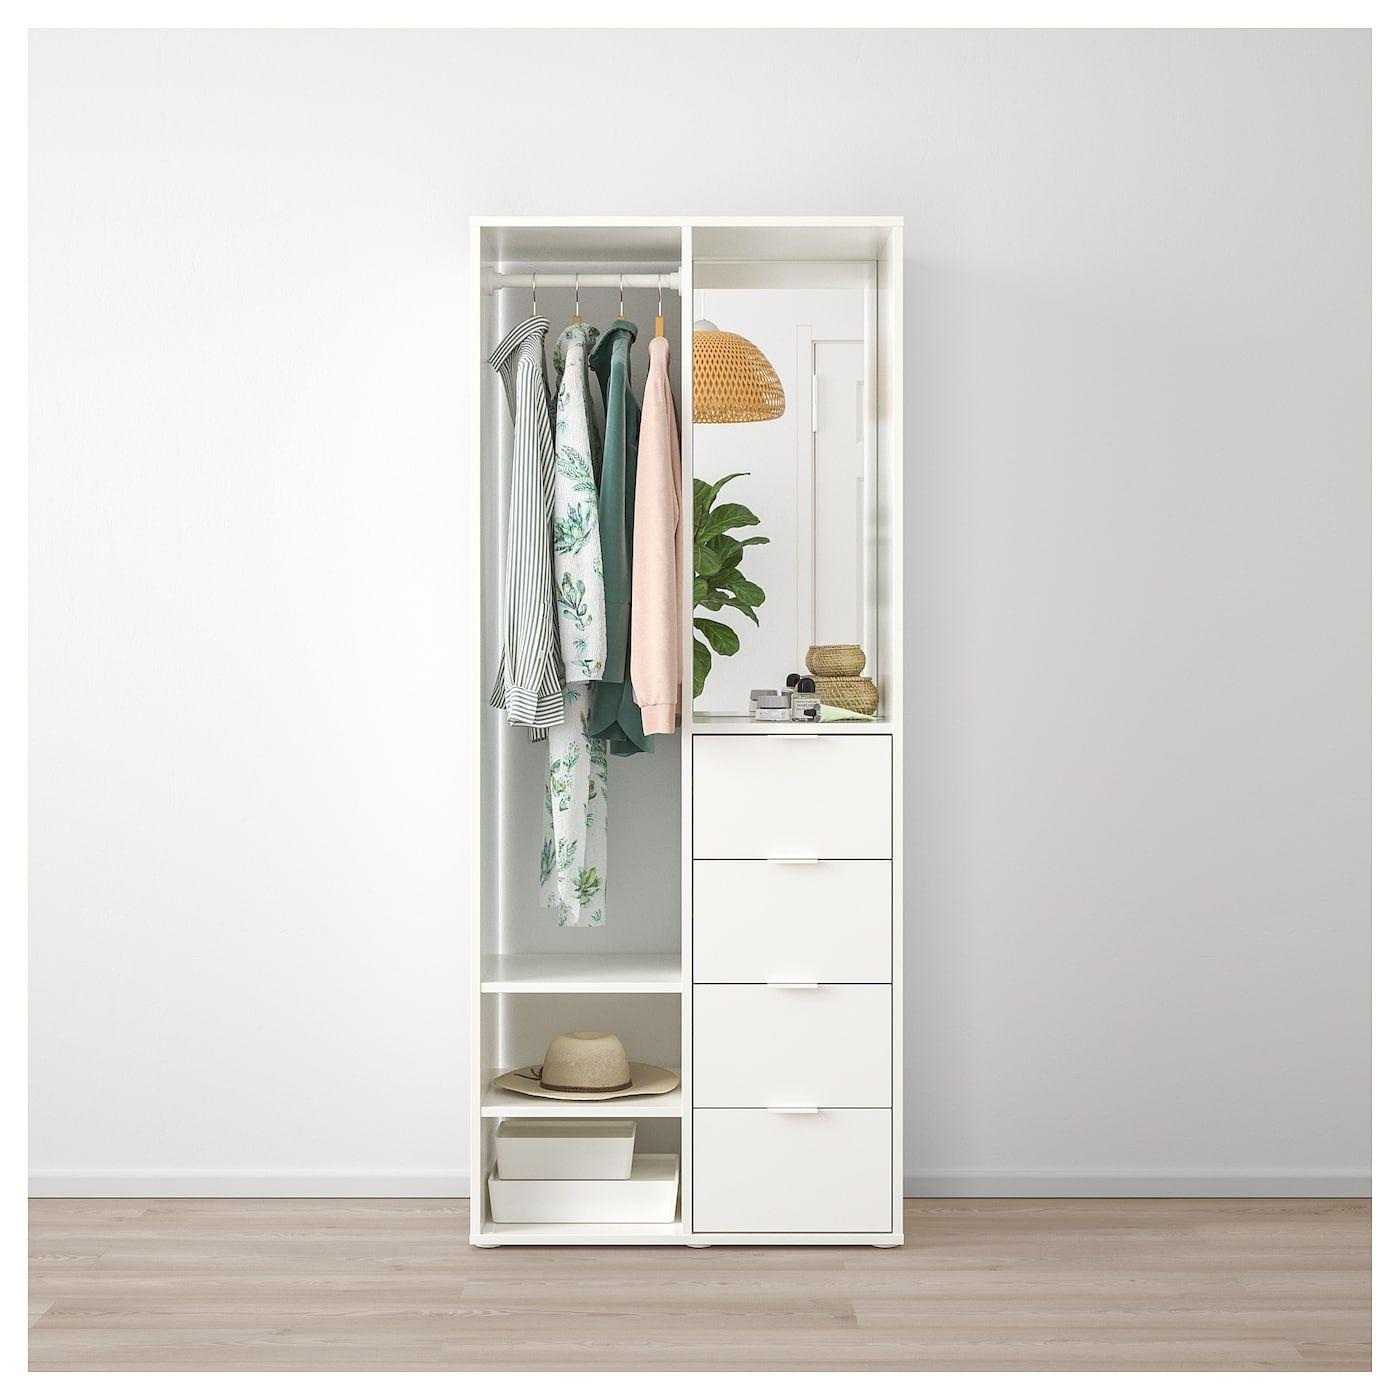 Sundlandet Open Wardrobe White 31 1 8x17 3 8x73 5 8 Ikea Open Wardrobe Diy Wardrobe Ikea